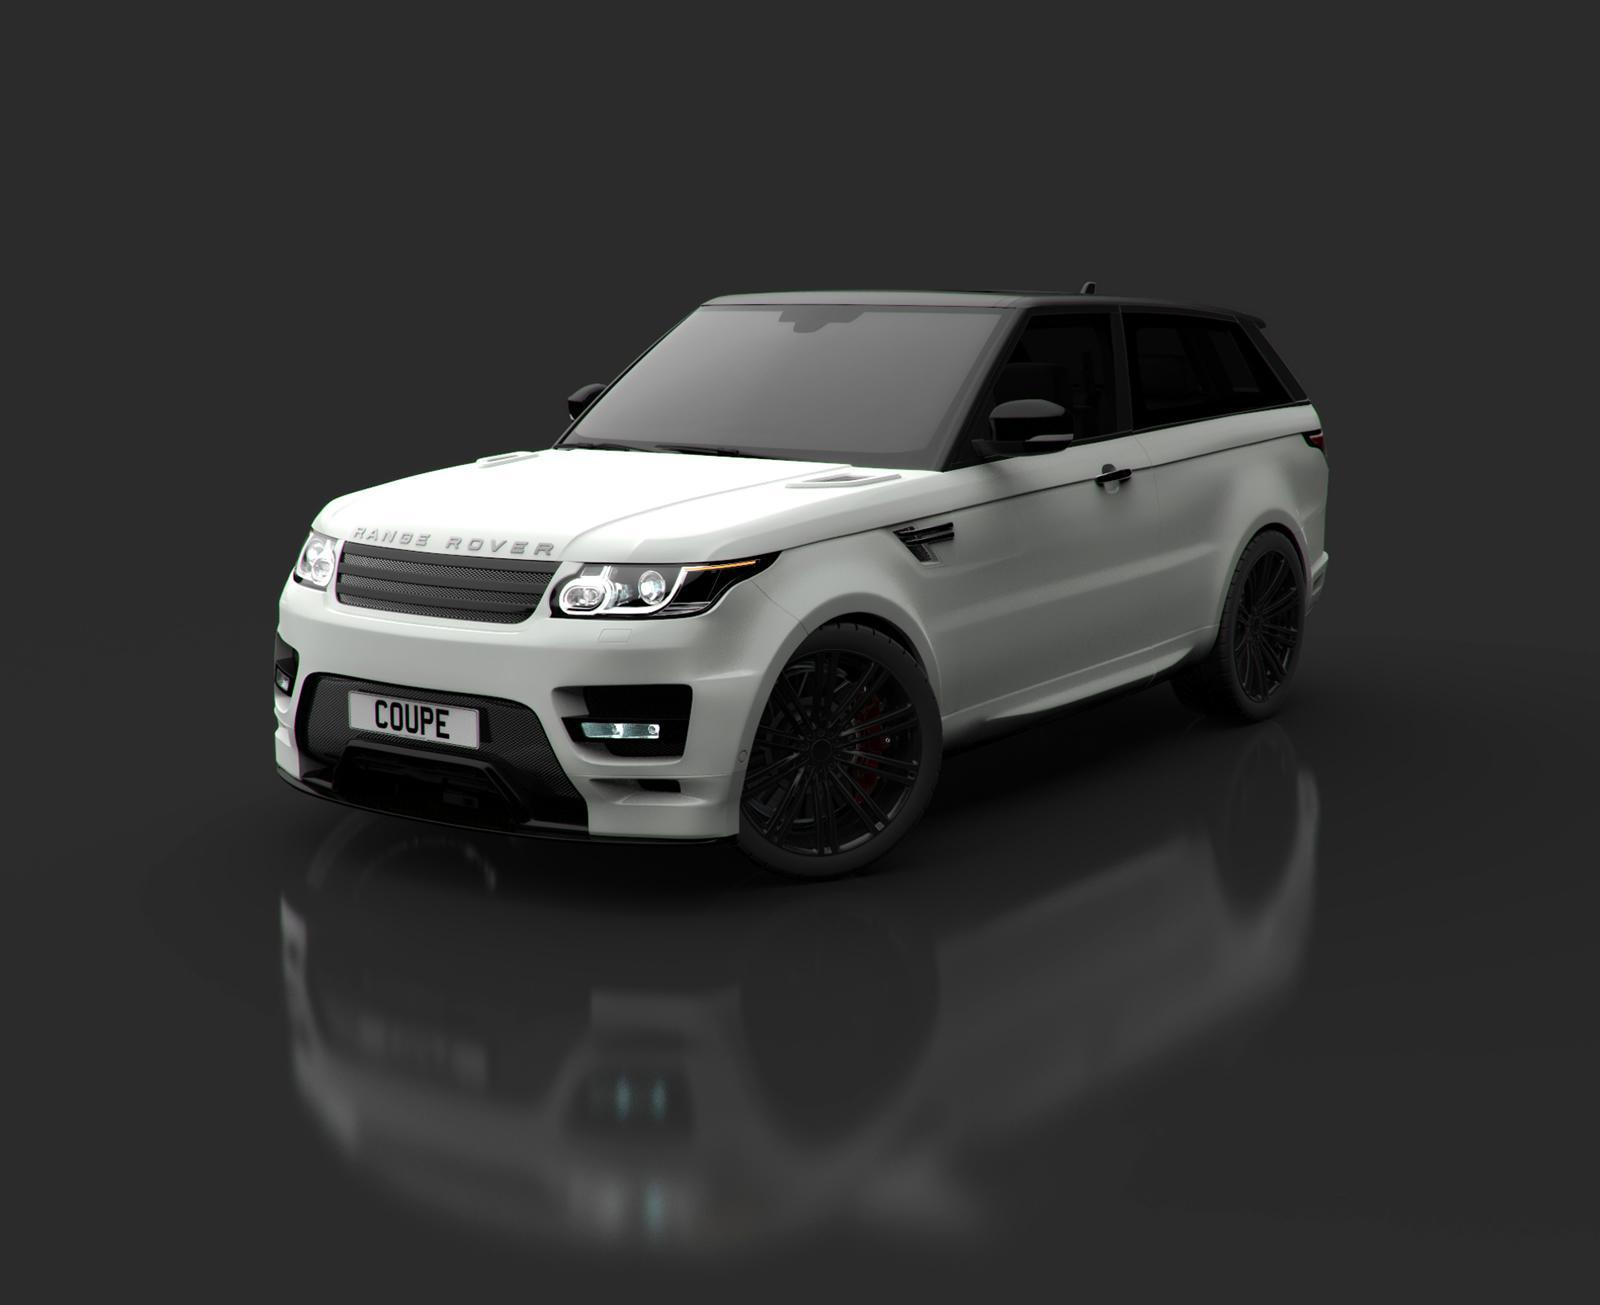 2014 Range Rover Sport Becomes A Coupe Via Bulgari